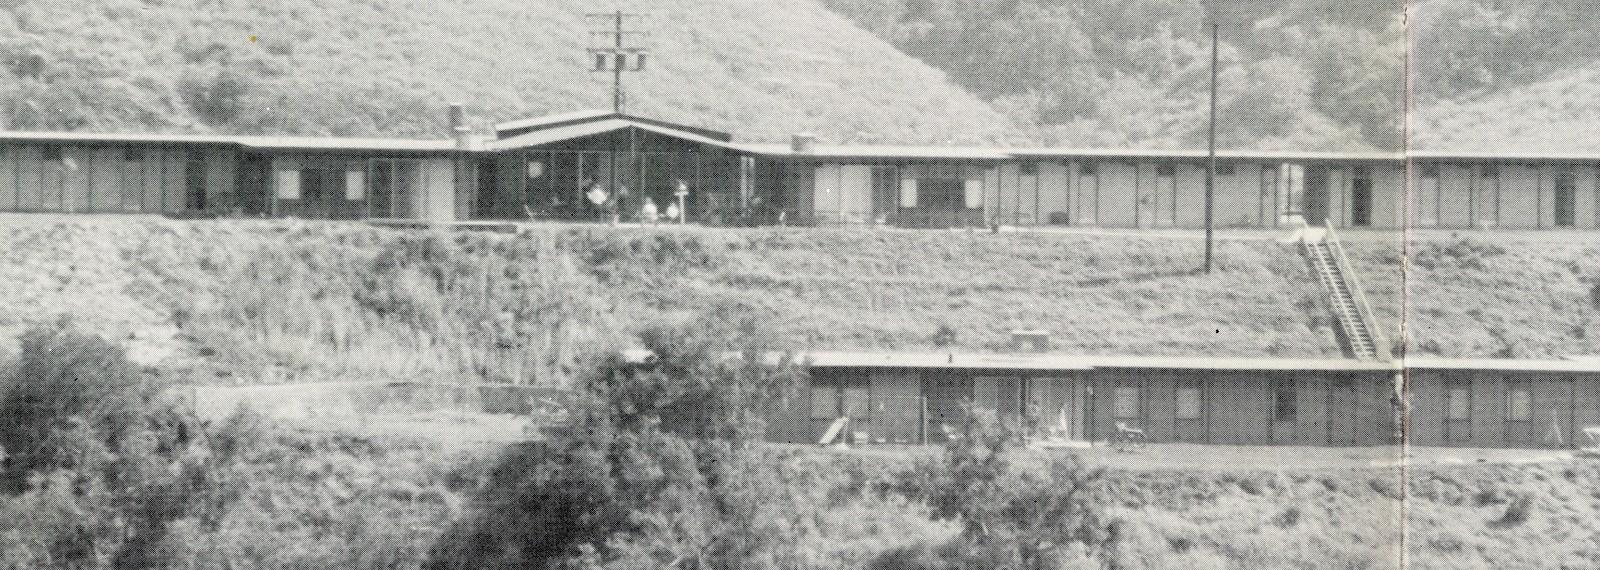 OVS Upper Campus Boys' Dorm